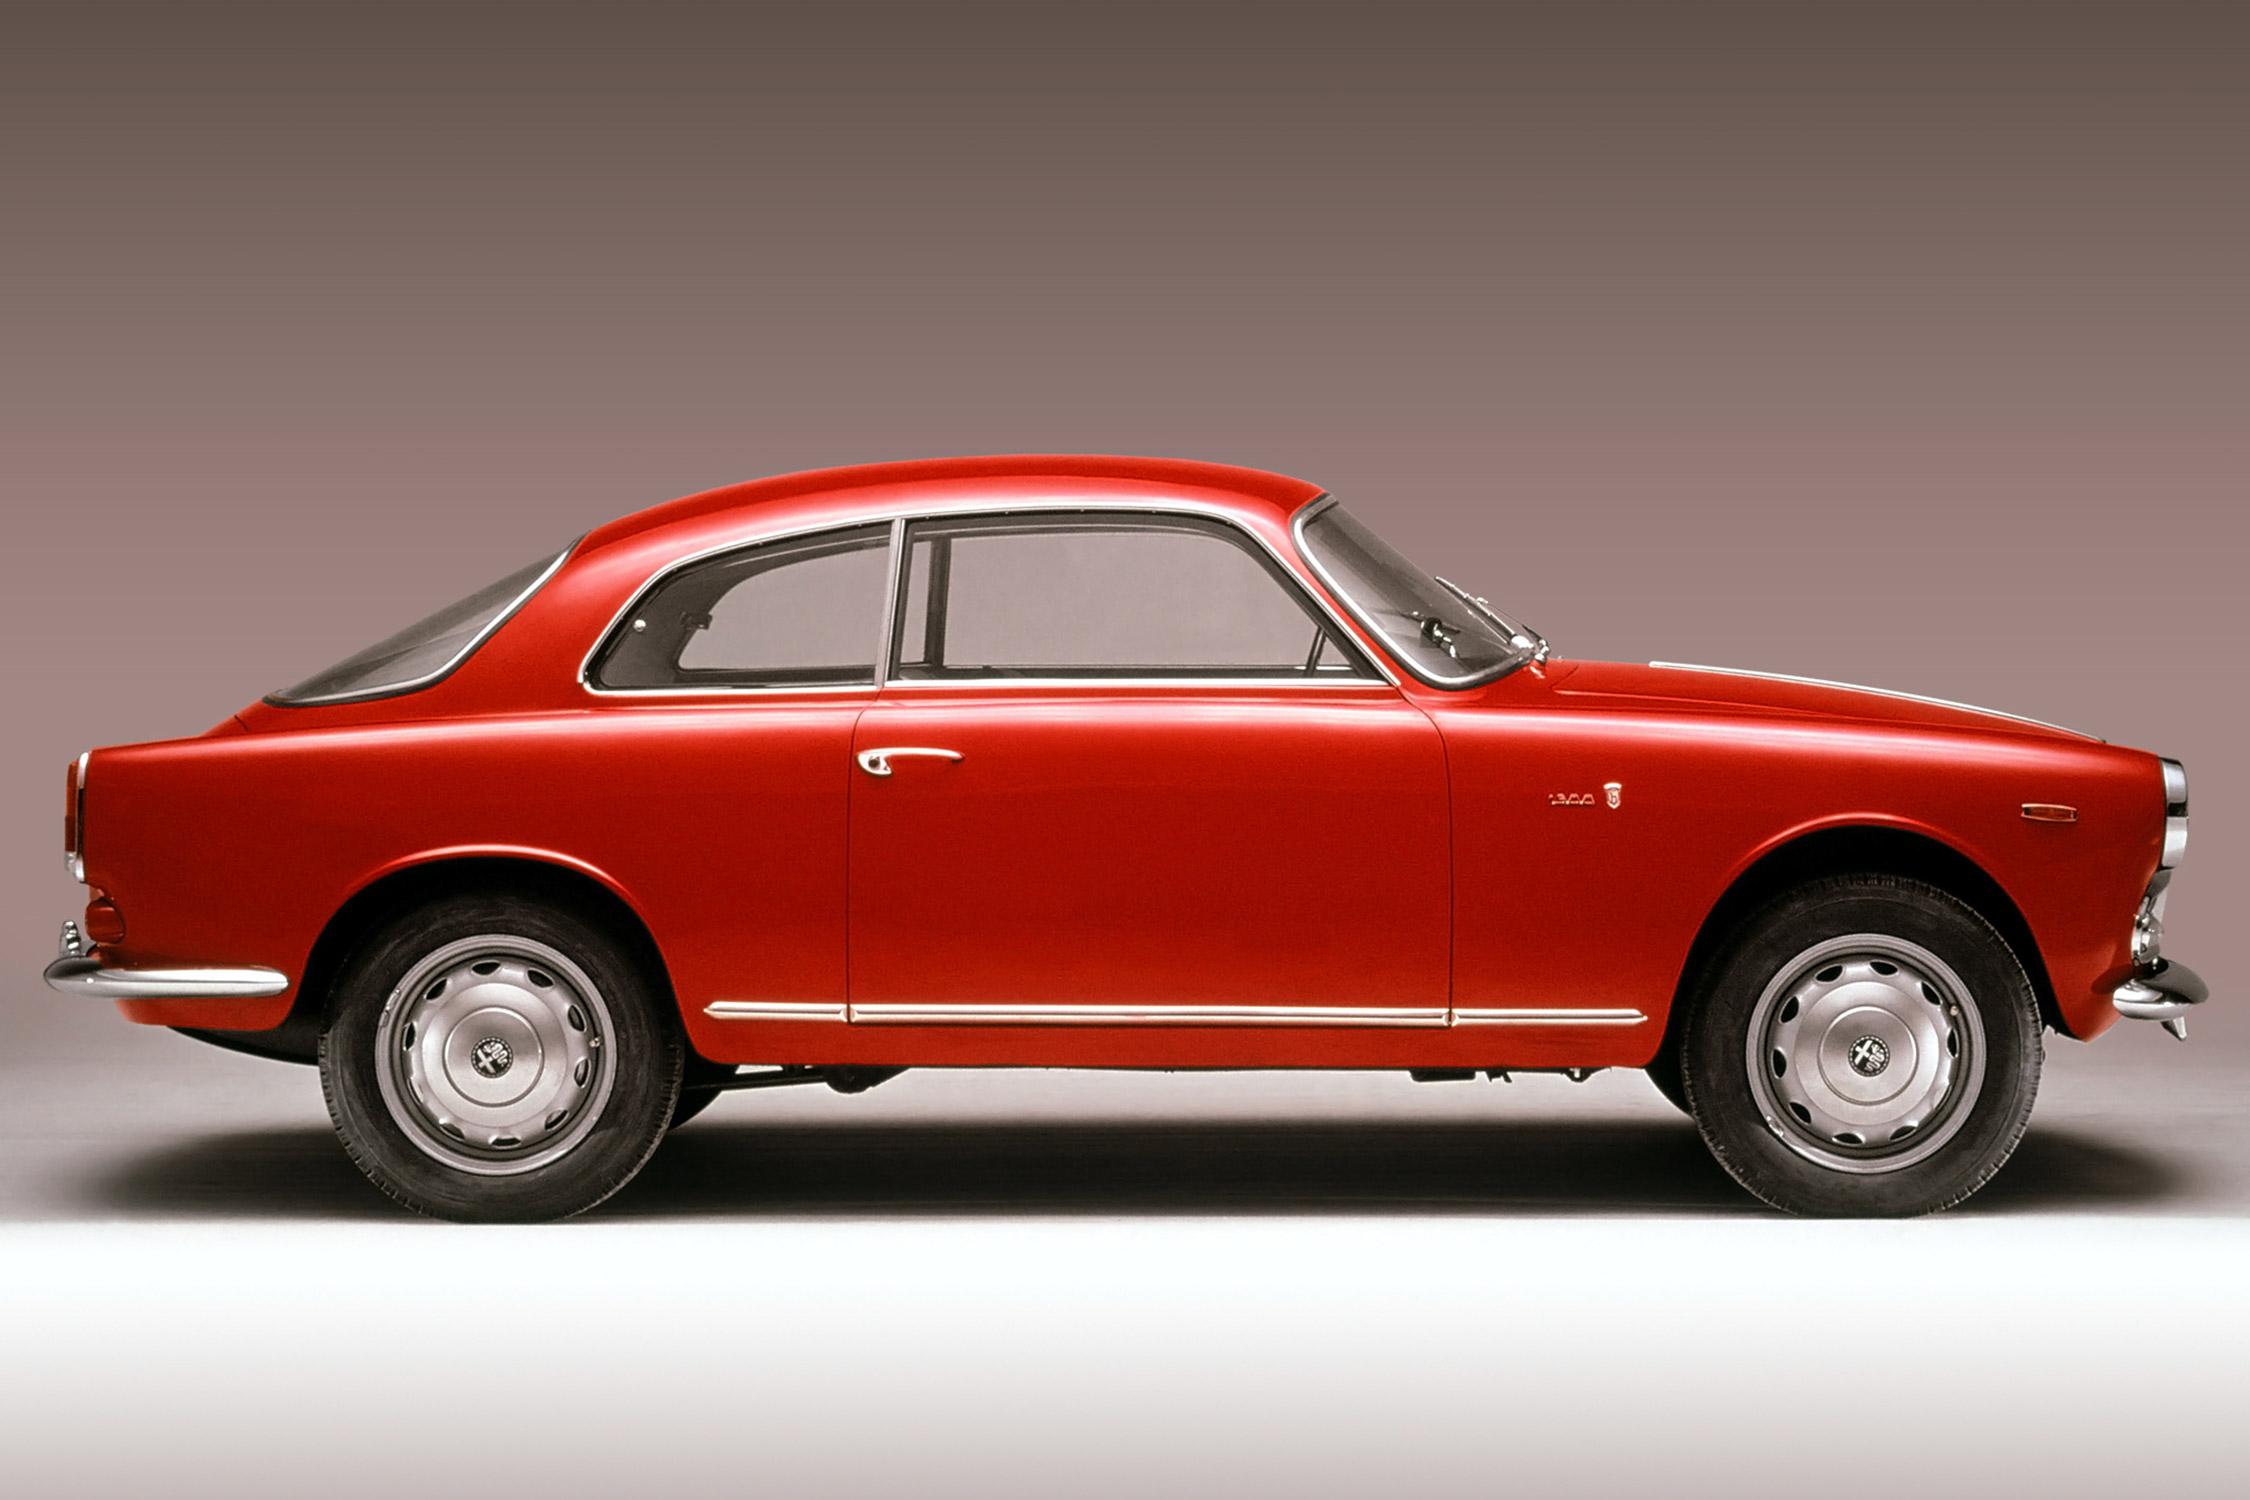 acheter une alfa romeo giulietta sprint 750 1962 1964 guide d 39 achat motorlegend. Black Bedroom Furniture Sets. Home Design Ideas